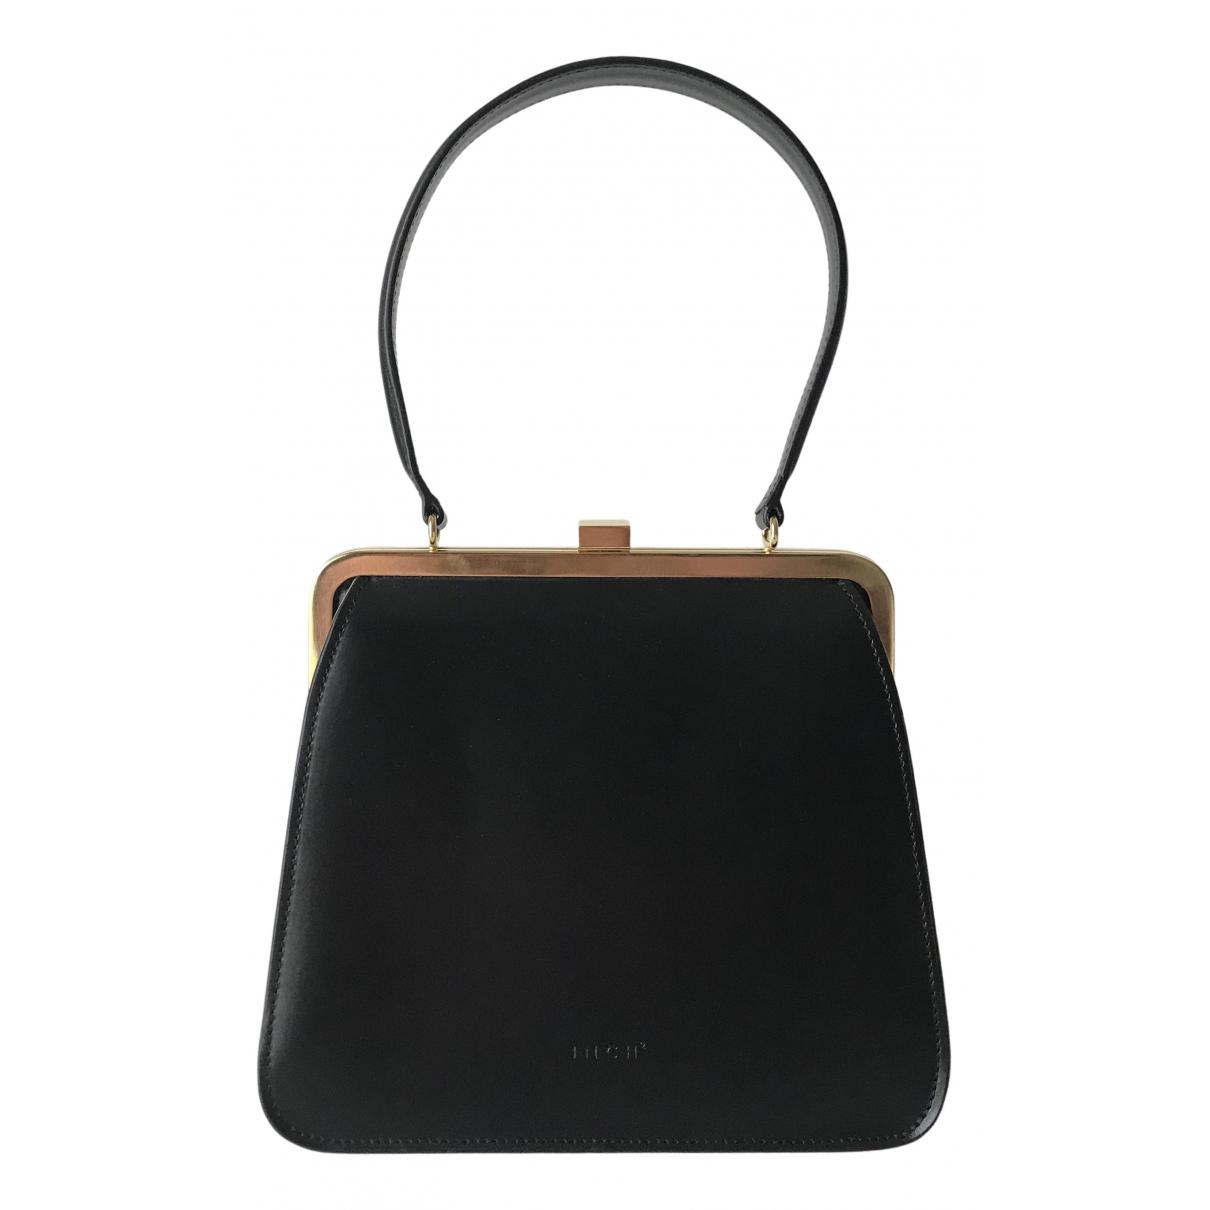 Inch2 \N Black Leather handbag for Women \N